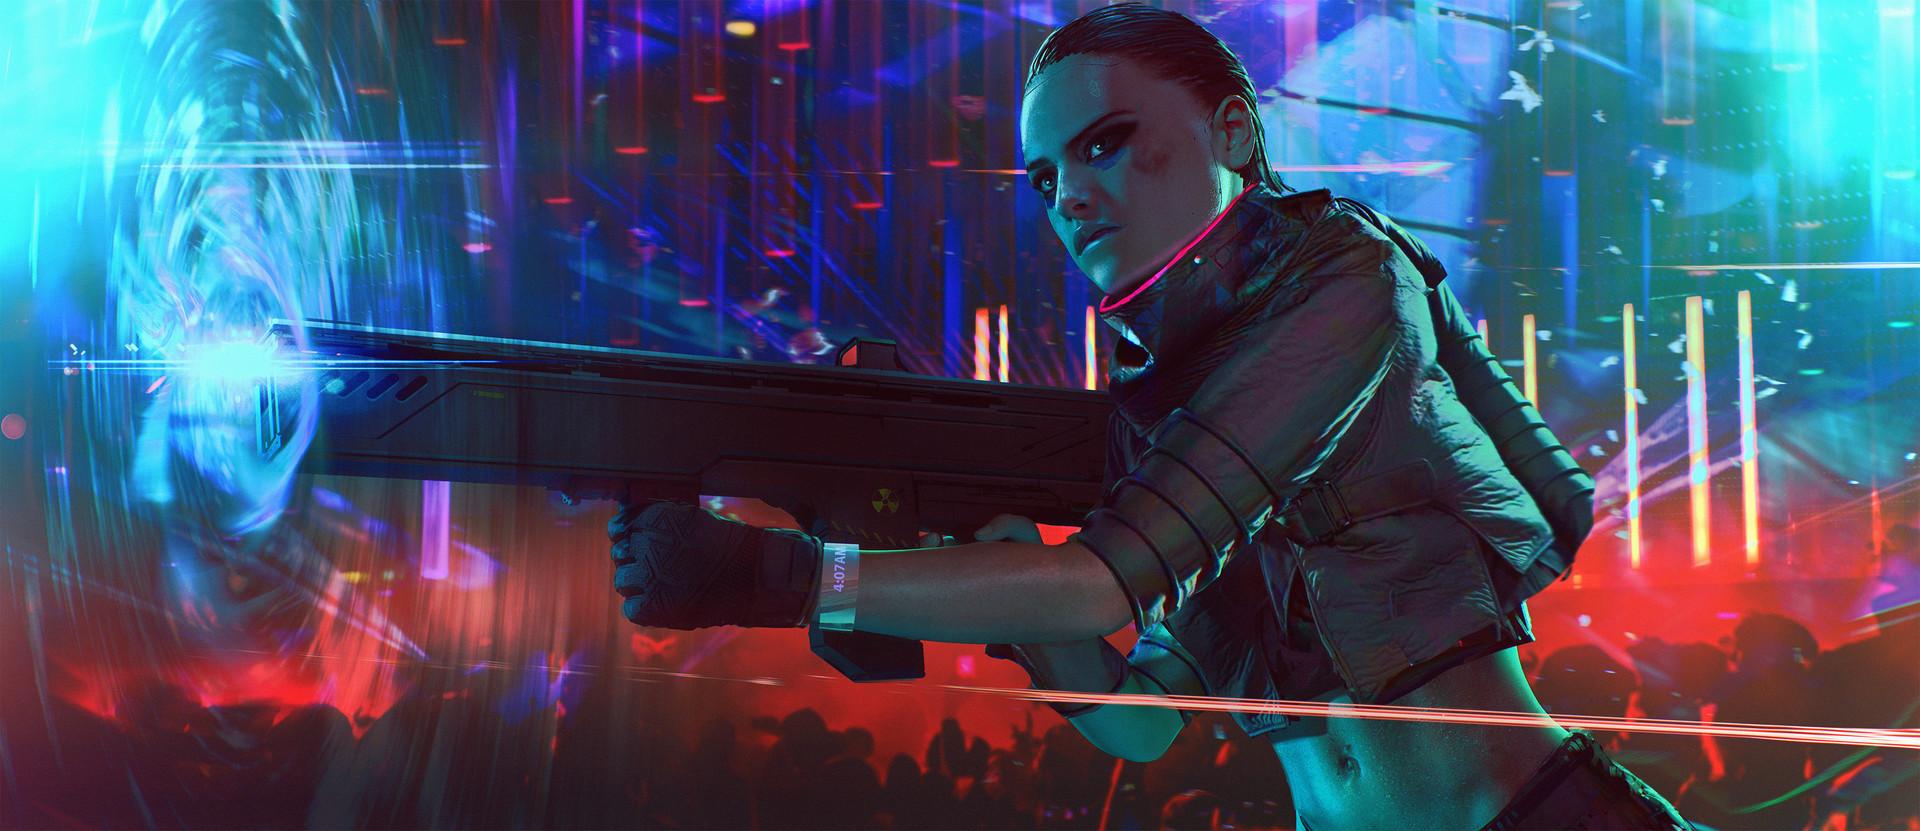 Layne johnson cyberpunk ravefight